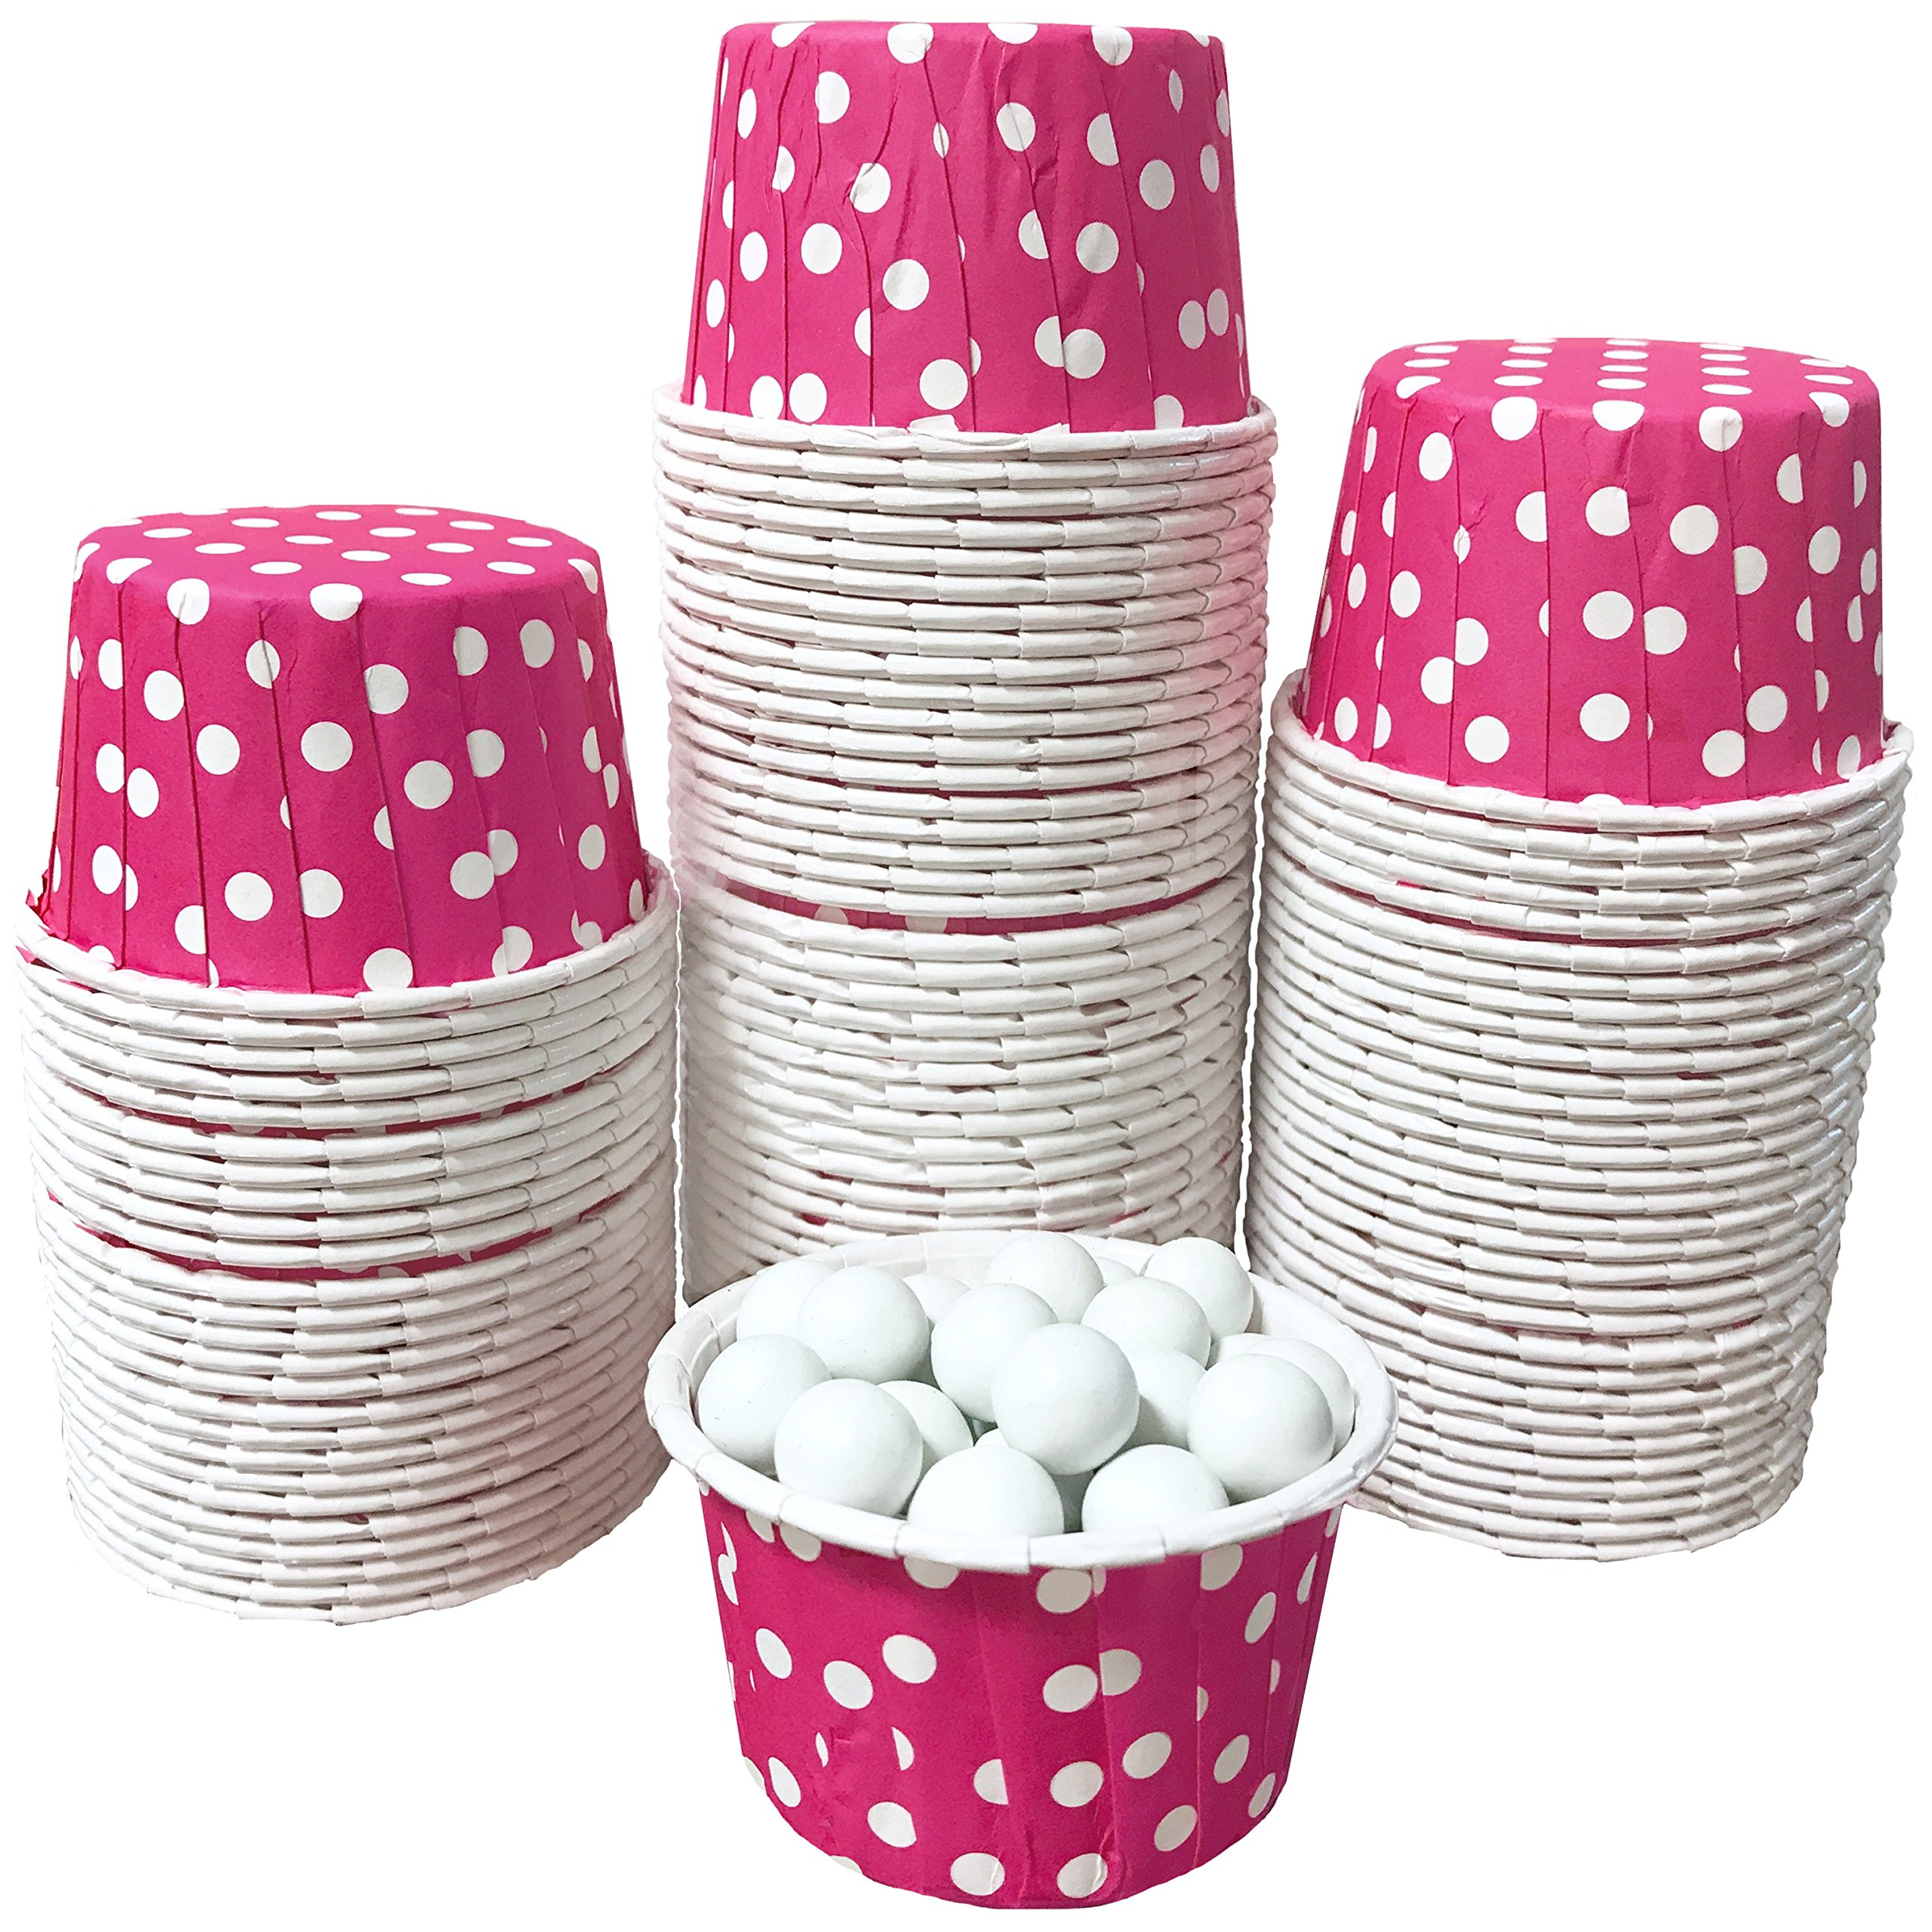 Candy Nut Mini Baking Paper Treat Cups - Hot Pink White - Polka Dot - Bulk 100 Pack